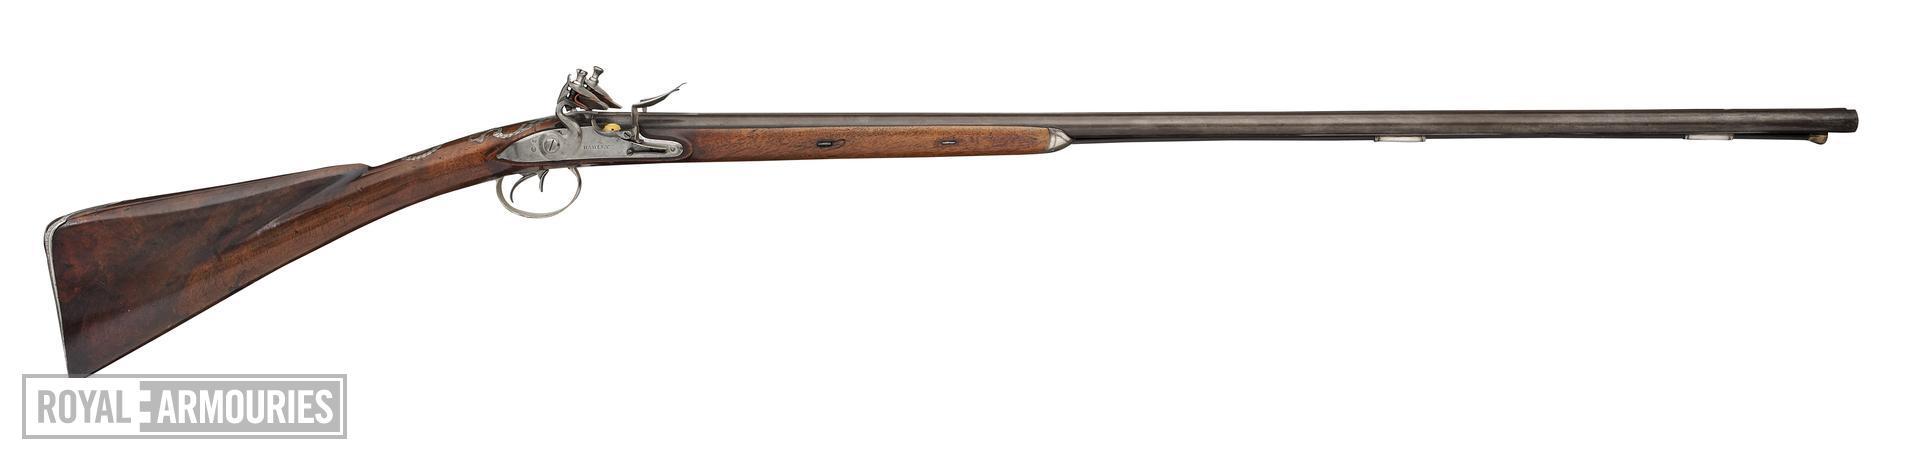 Flintlock double-barrelled shotgun - By Hadley